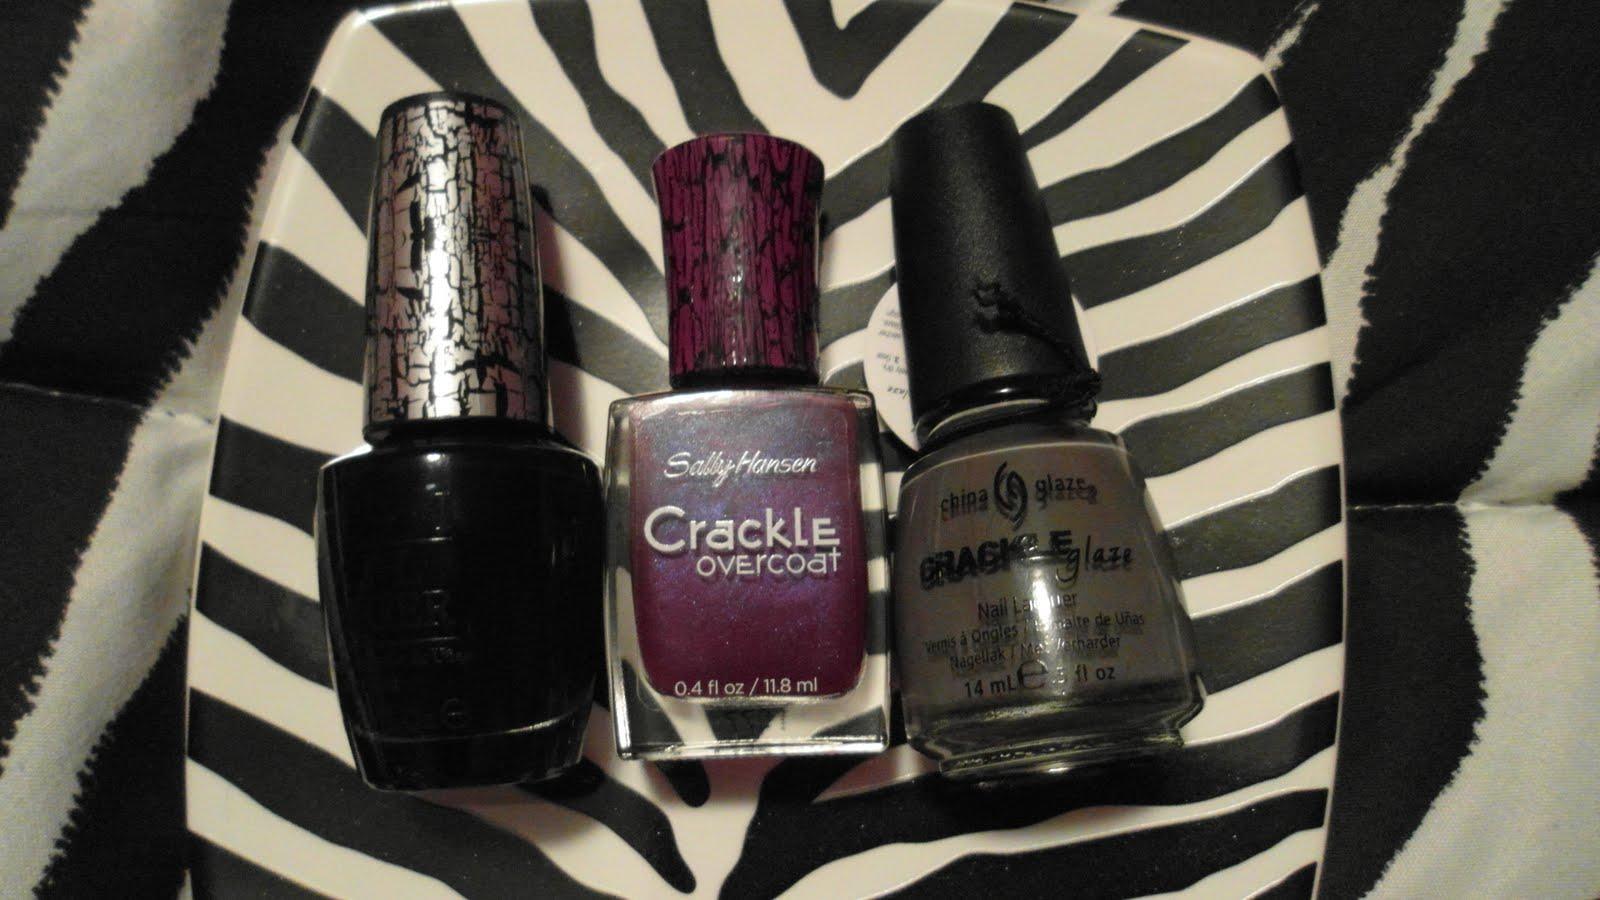 Crackle overcoat nail polish